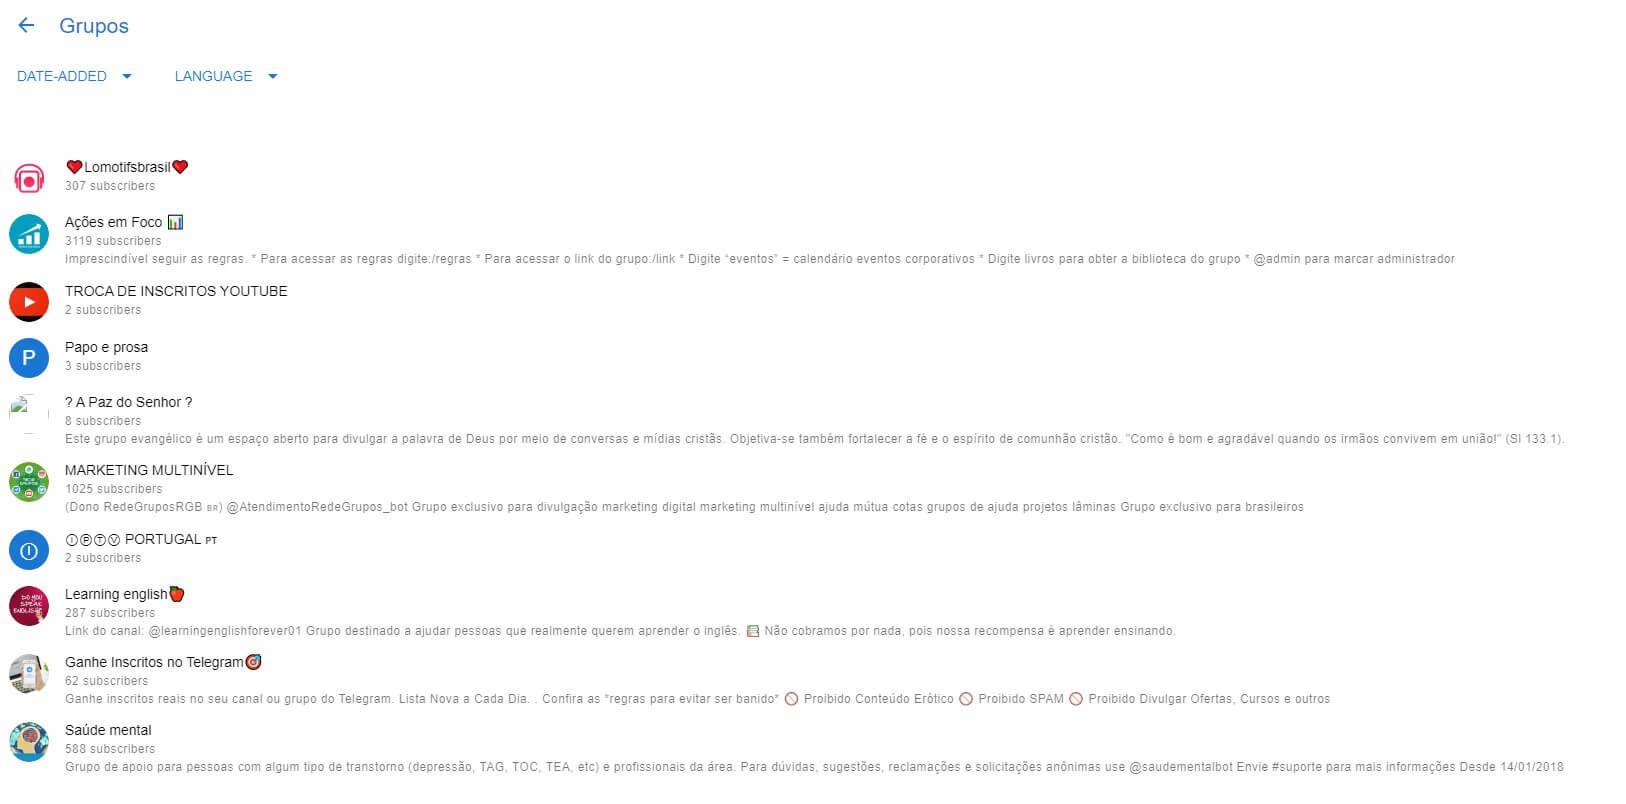 Grupos Telegram: imagem do site Telegroups